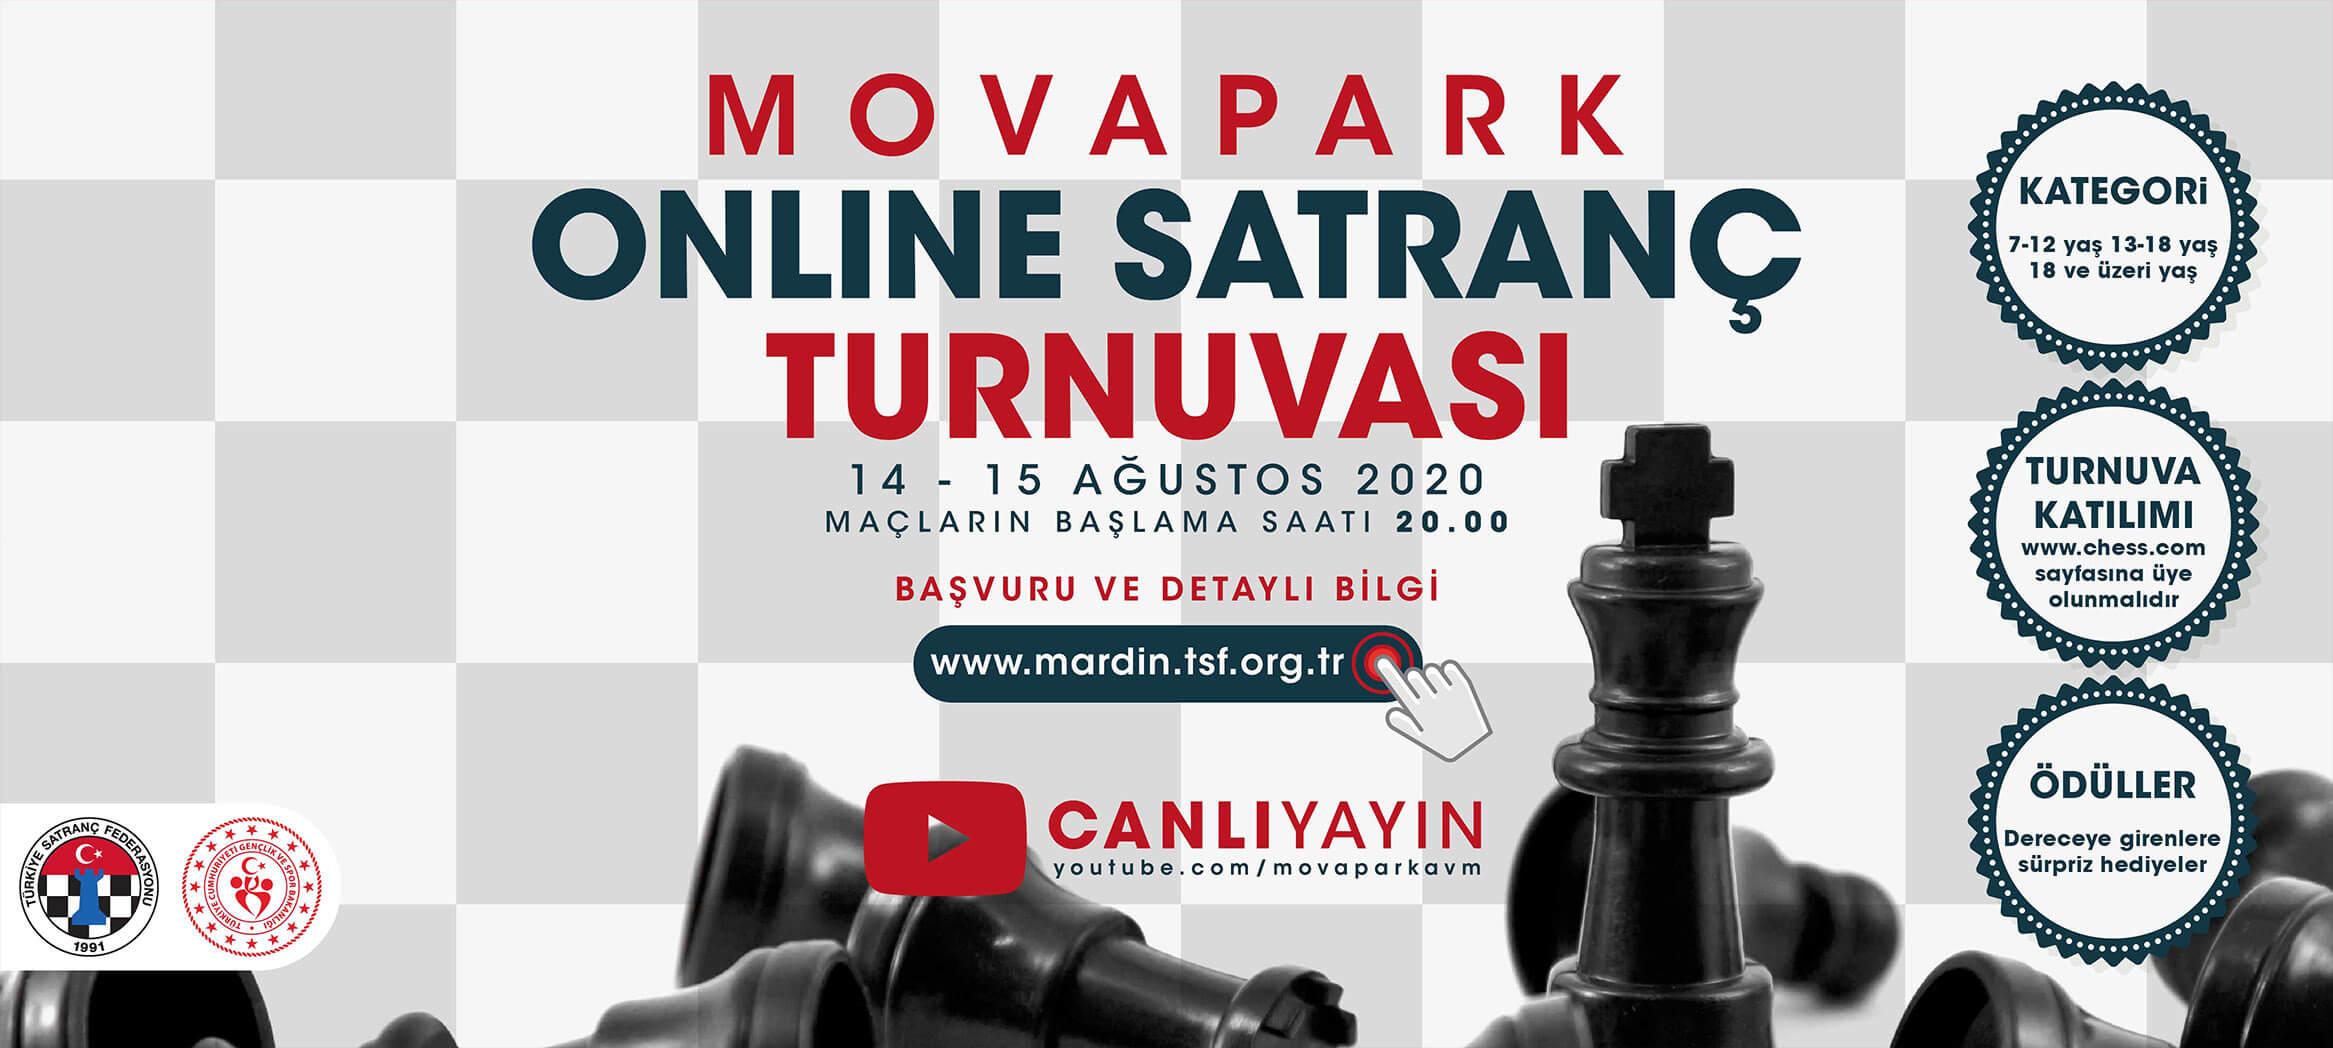 Movapark Online Satranç Turnuvası